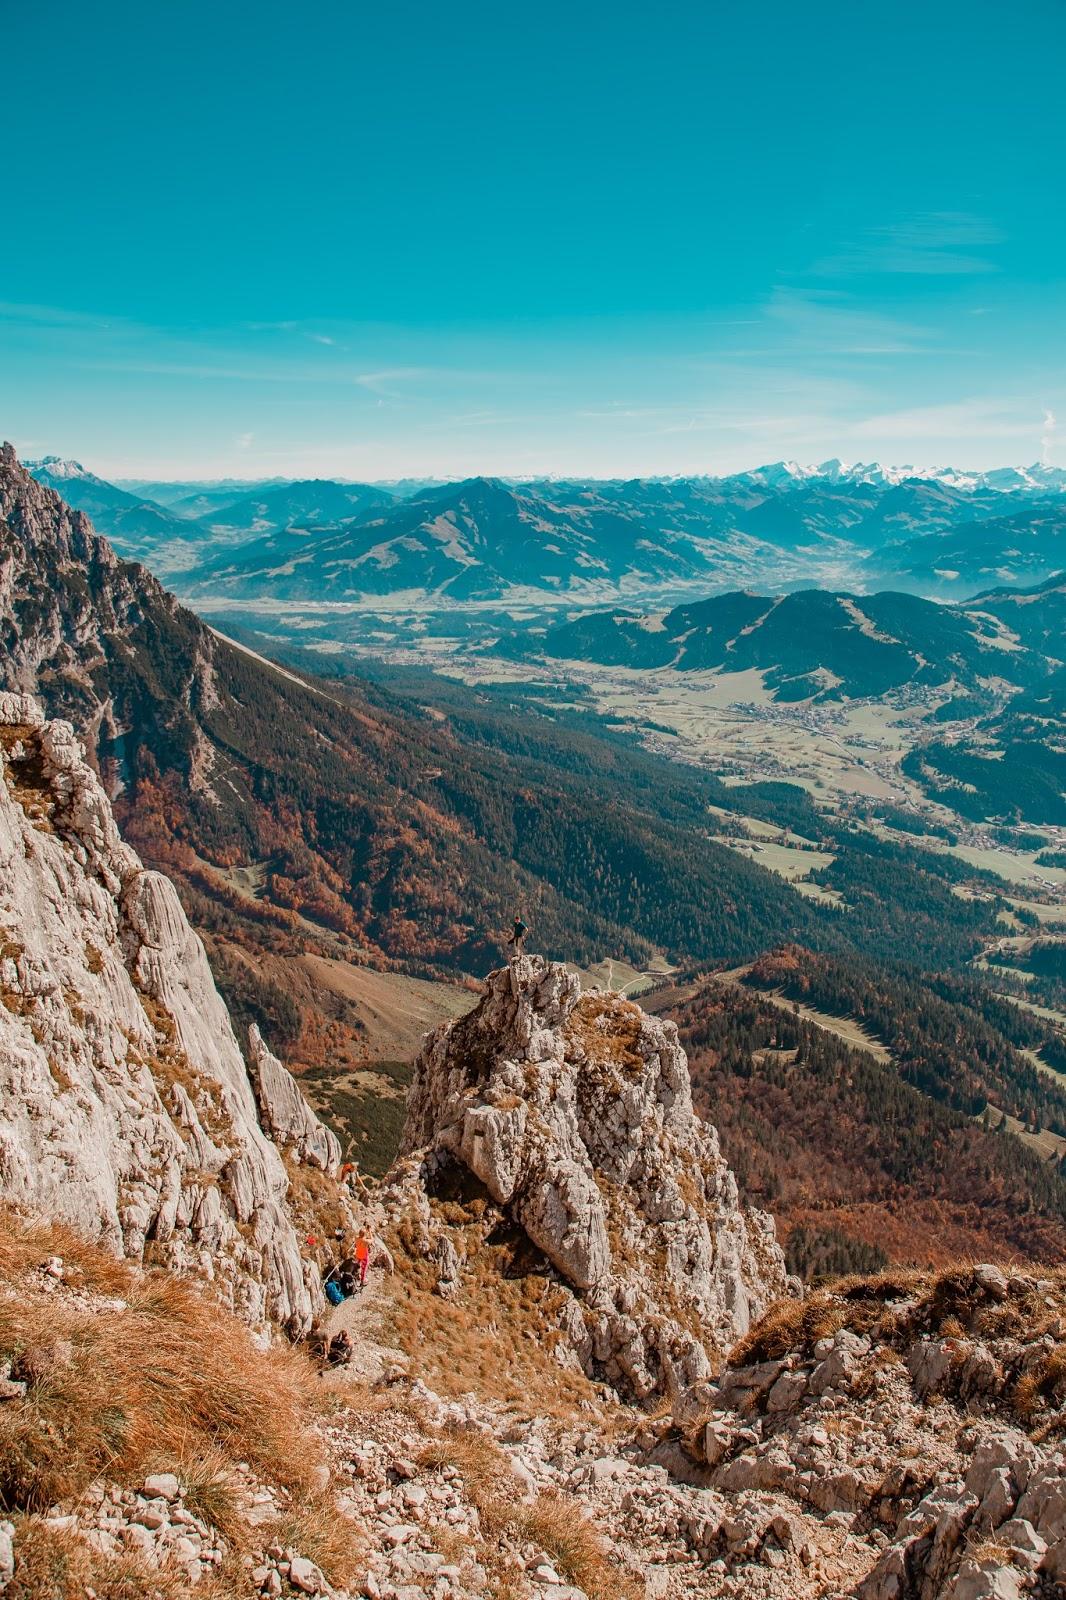 Bergtour Scheffauer  Wandern Wilder Kaiser  leichter Gipfel im Wilden Kaiser  Wandern-Tirol 06